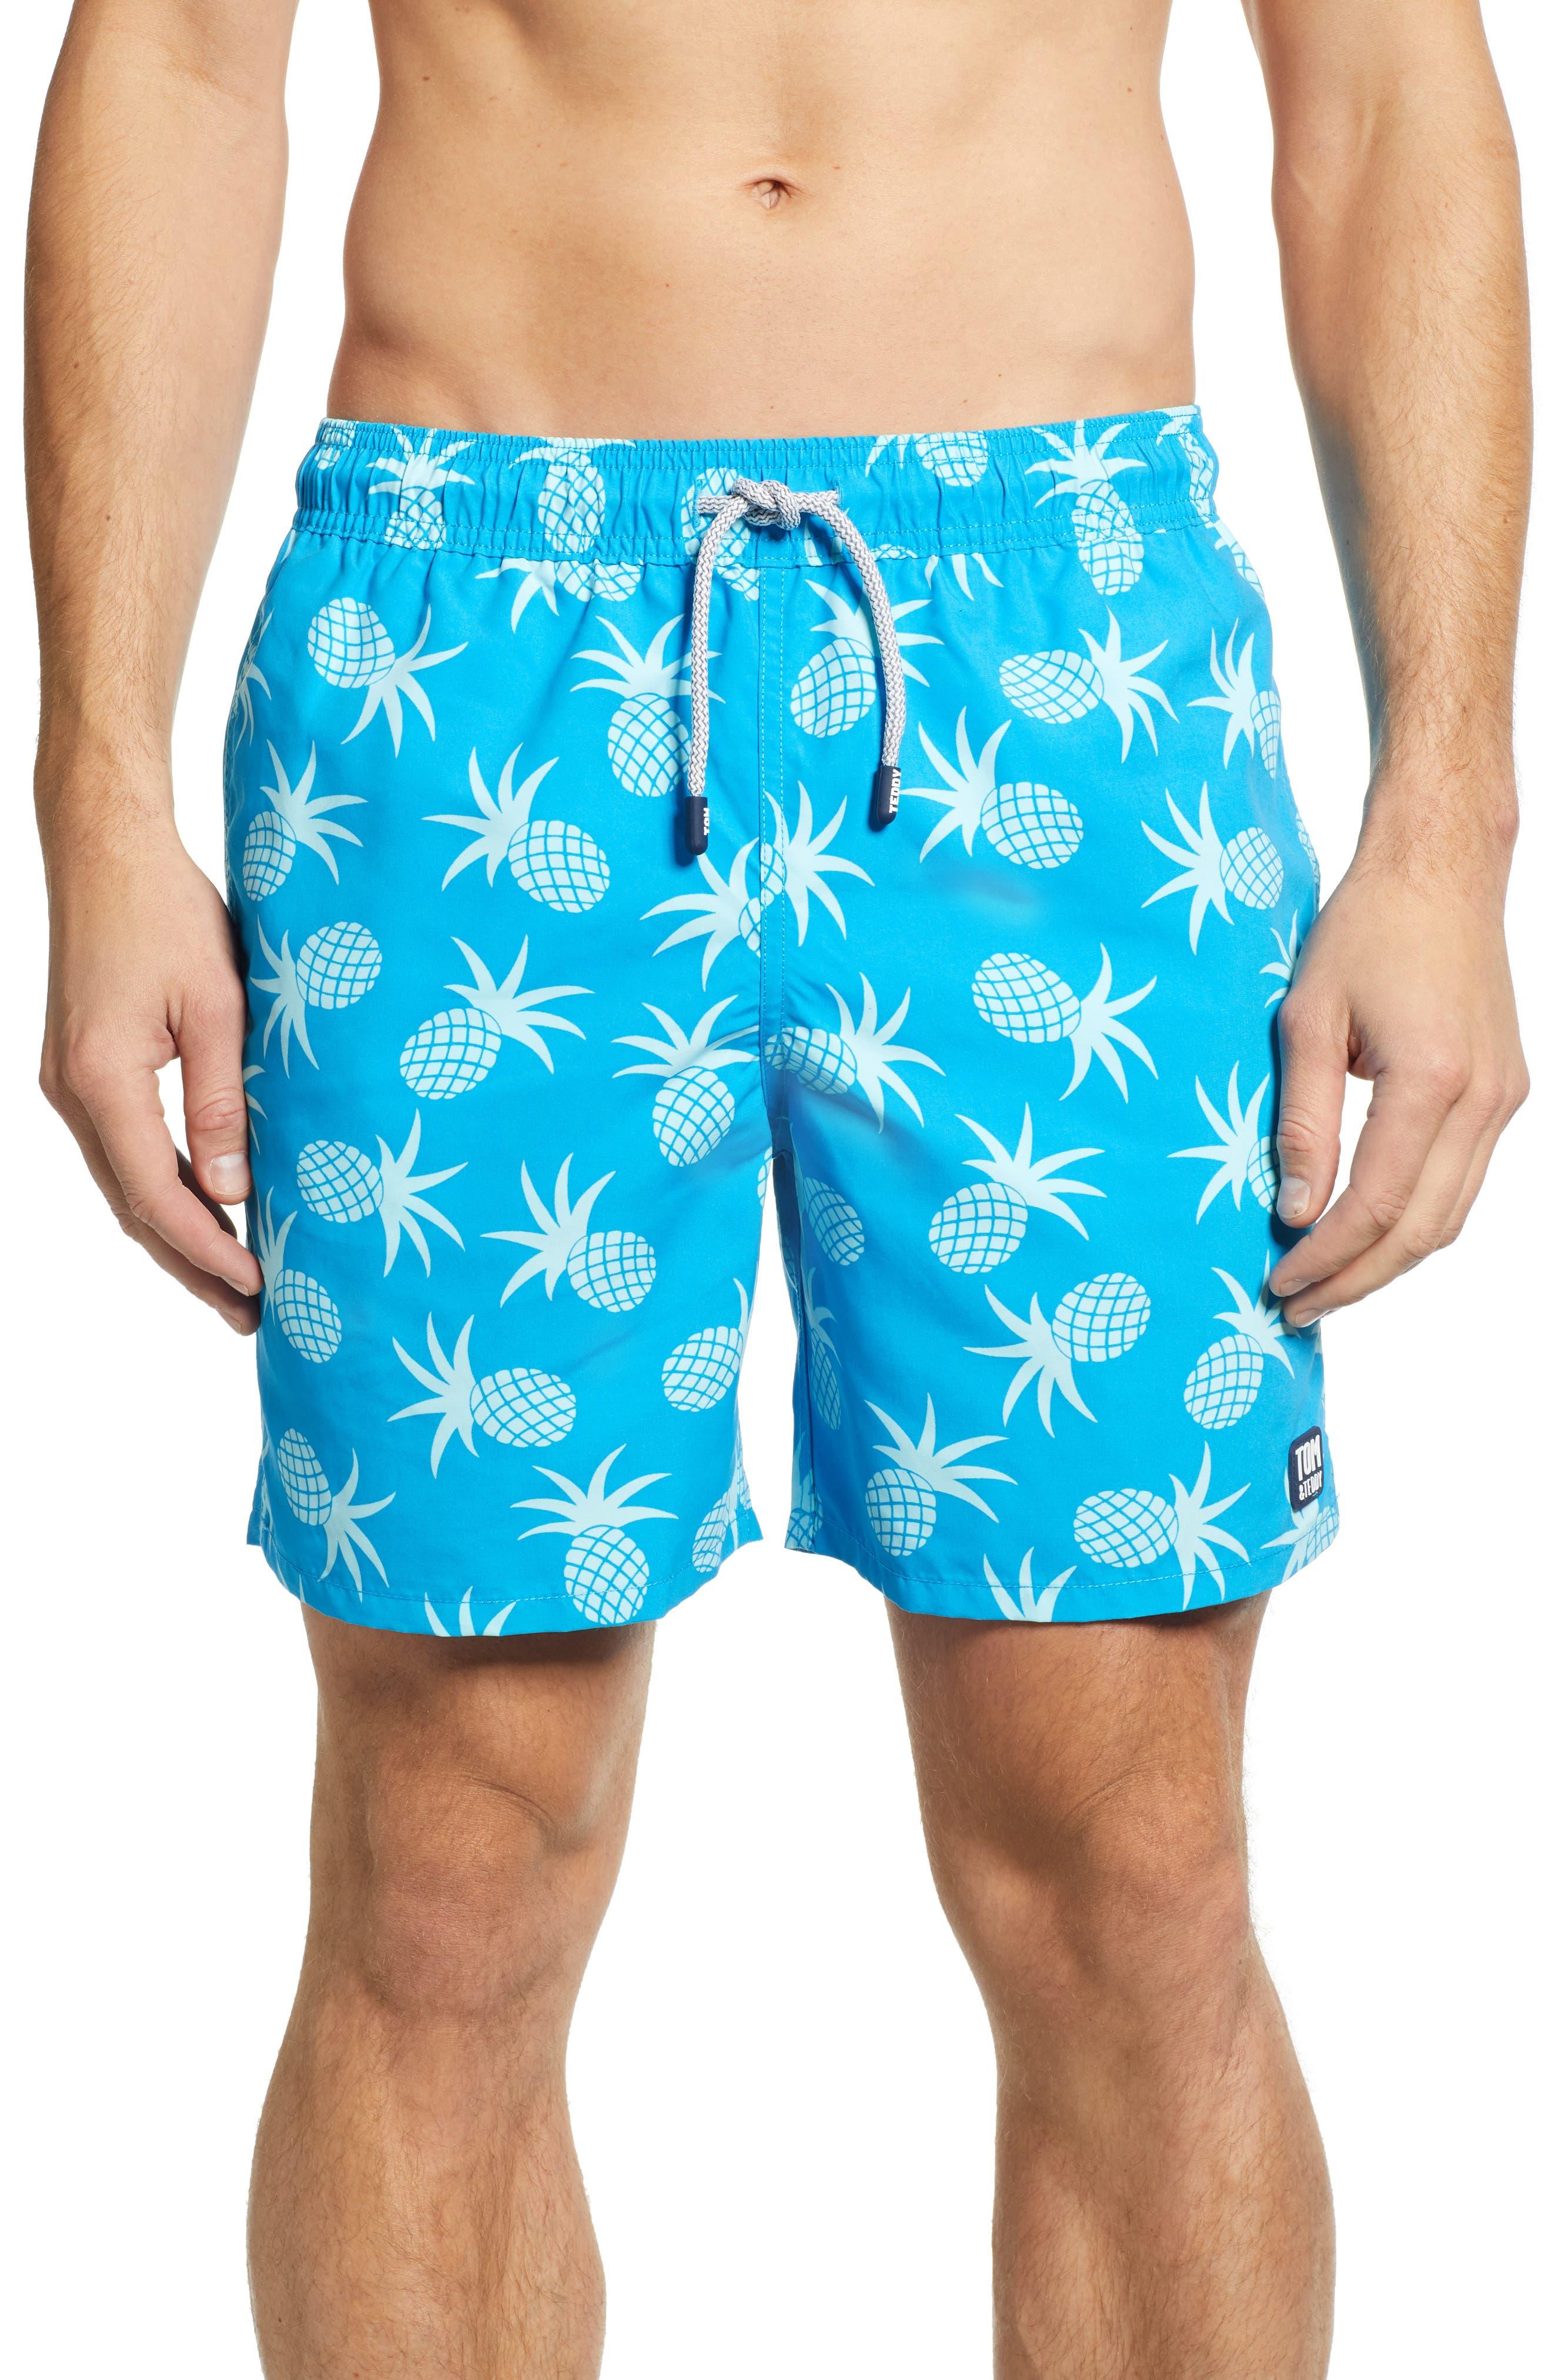 TOM & TEDDY Pineapple Print Swim Trunks in Crystal Blue